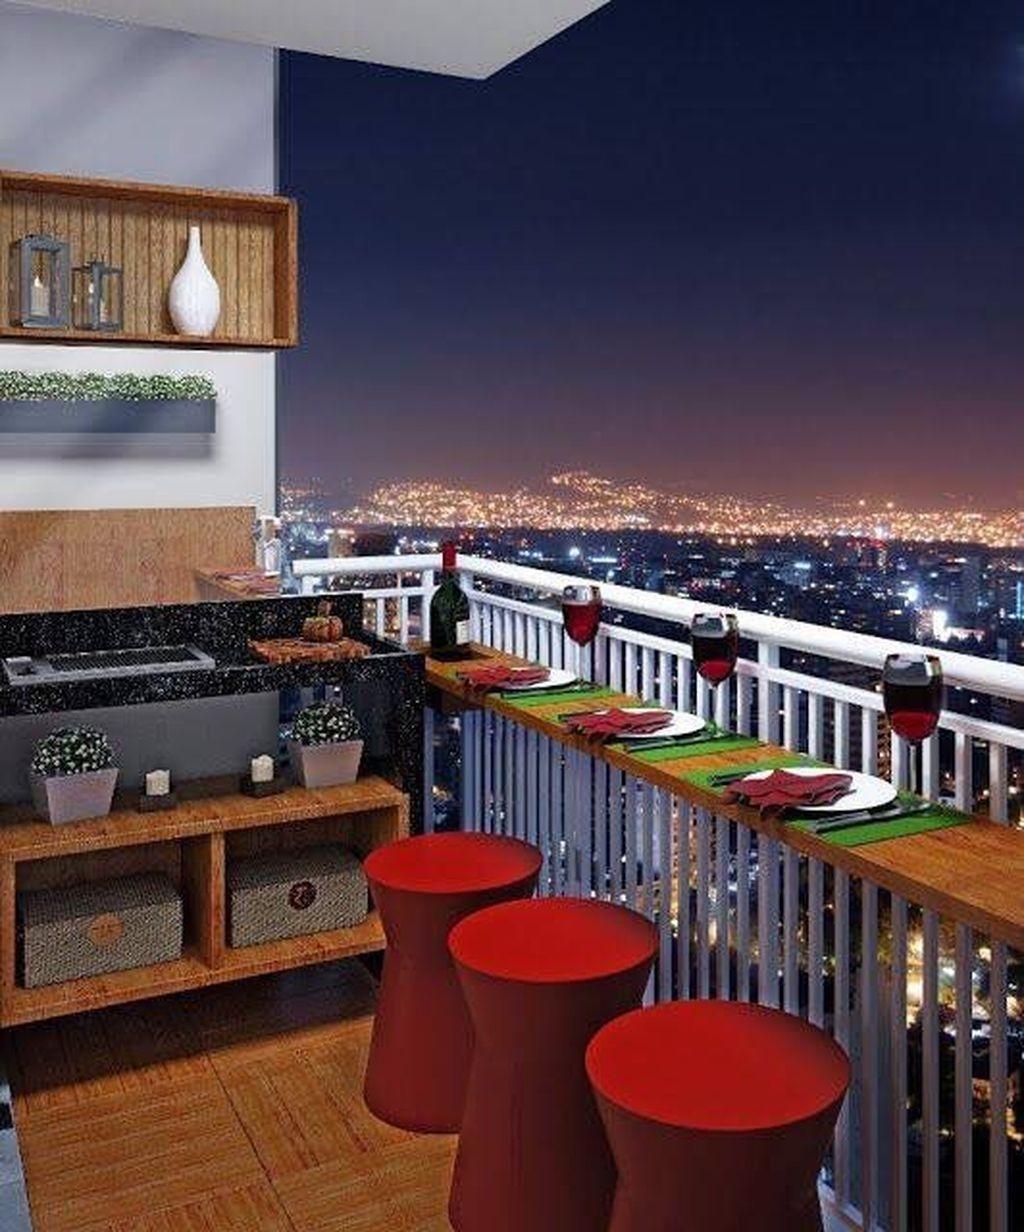 Enchanting Apartment Balcony Decorating Ideas22